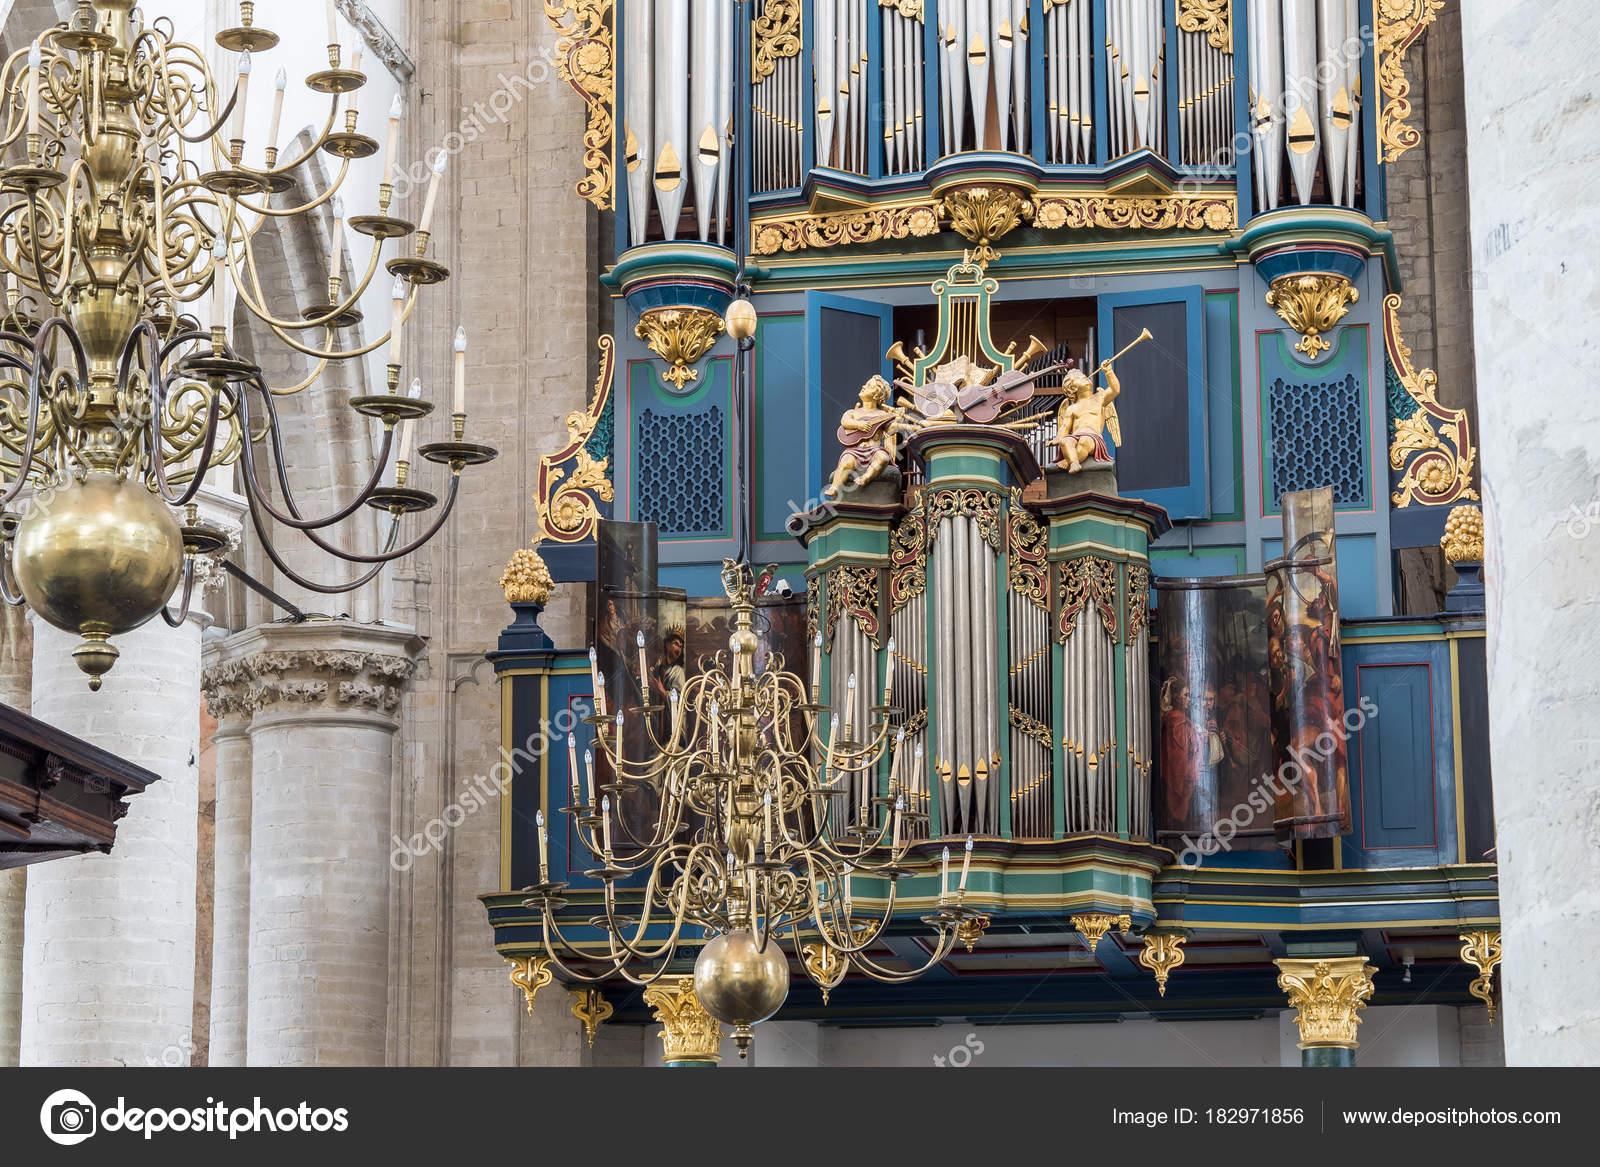 The Flentrop organ in the Grote Kerk in Breda, Holland